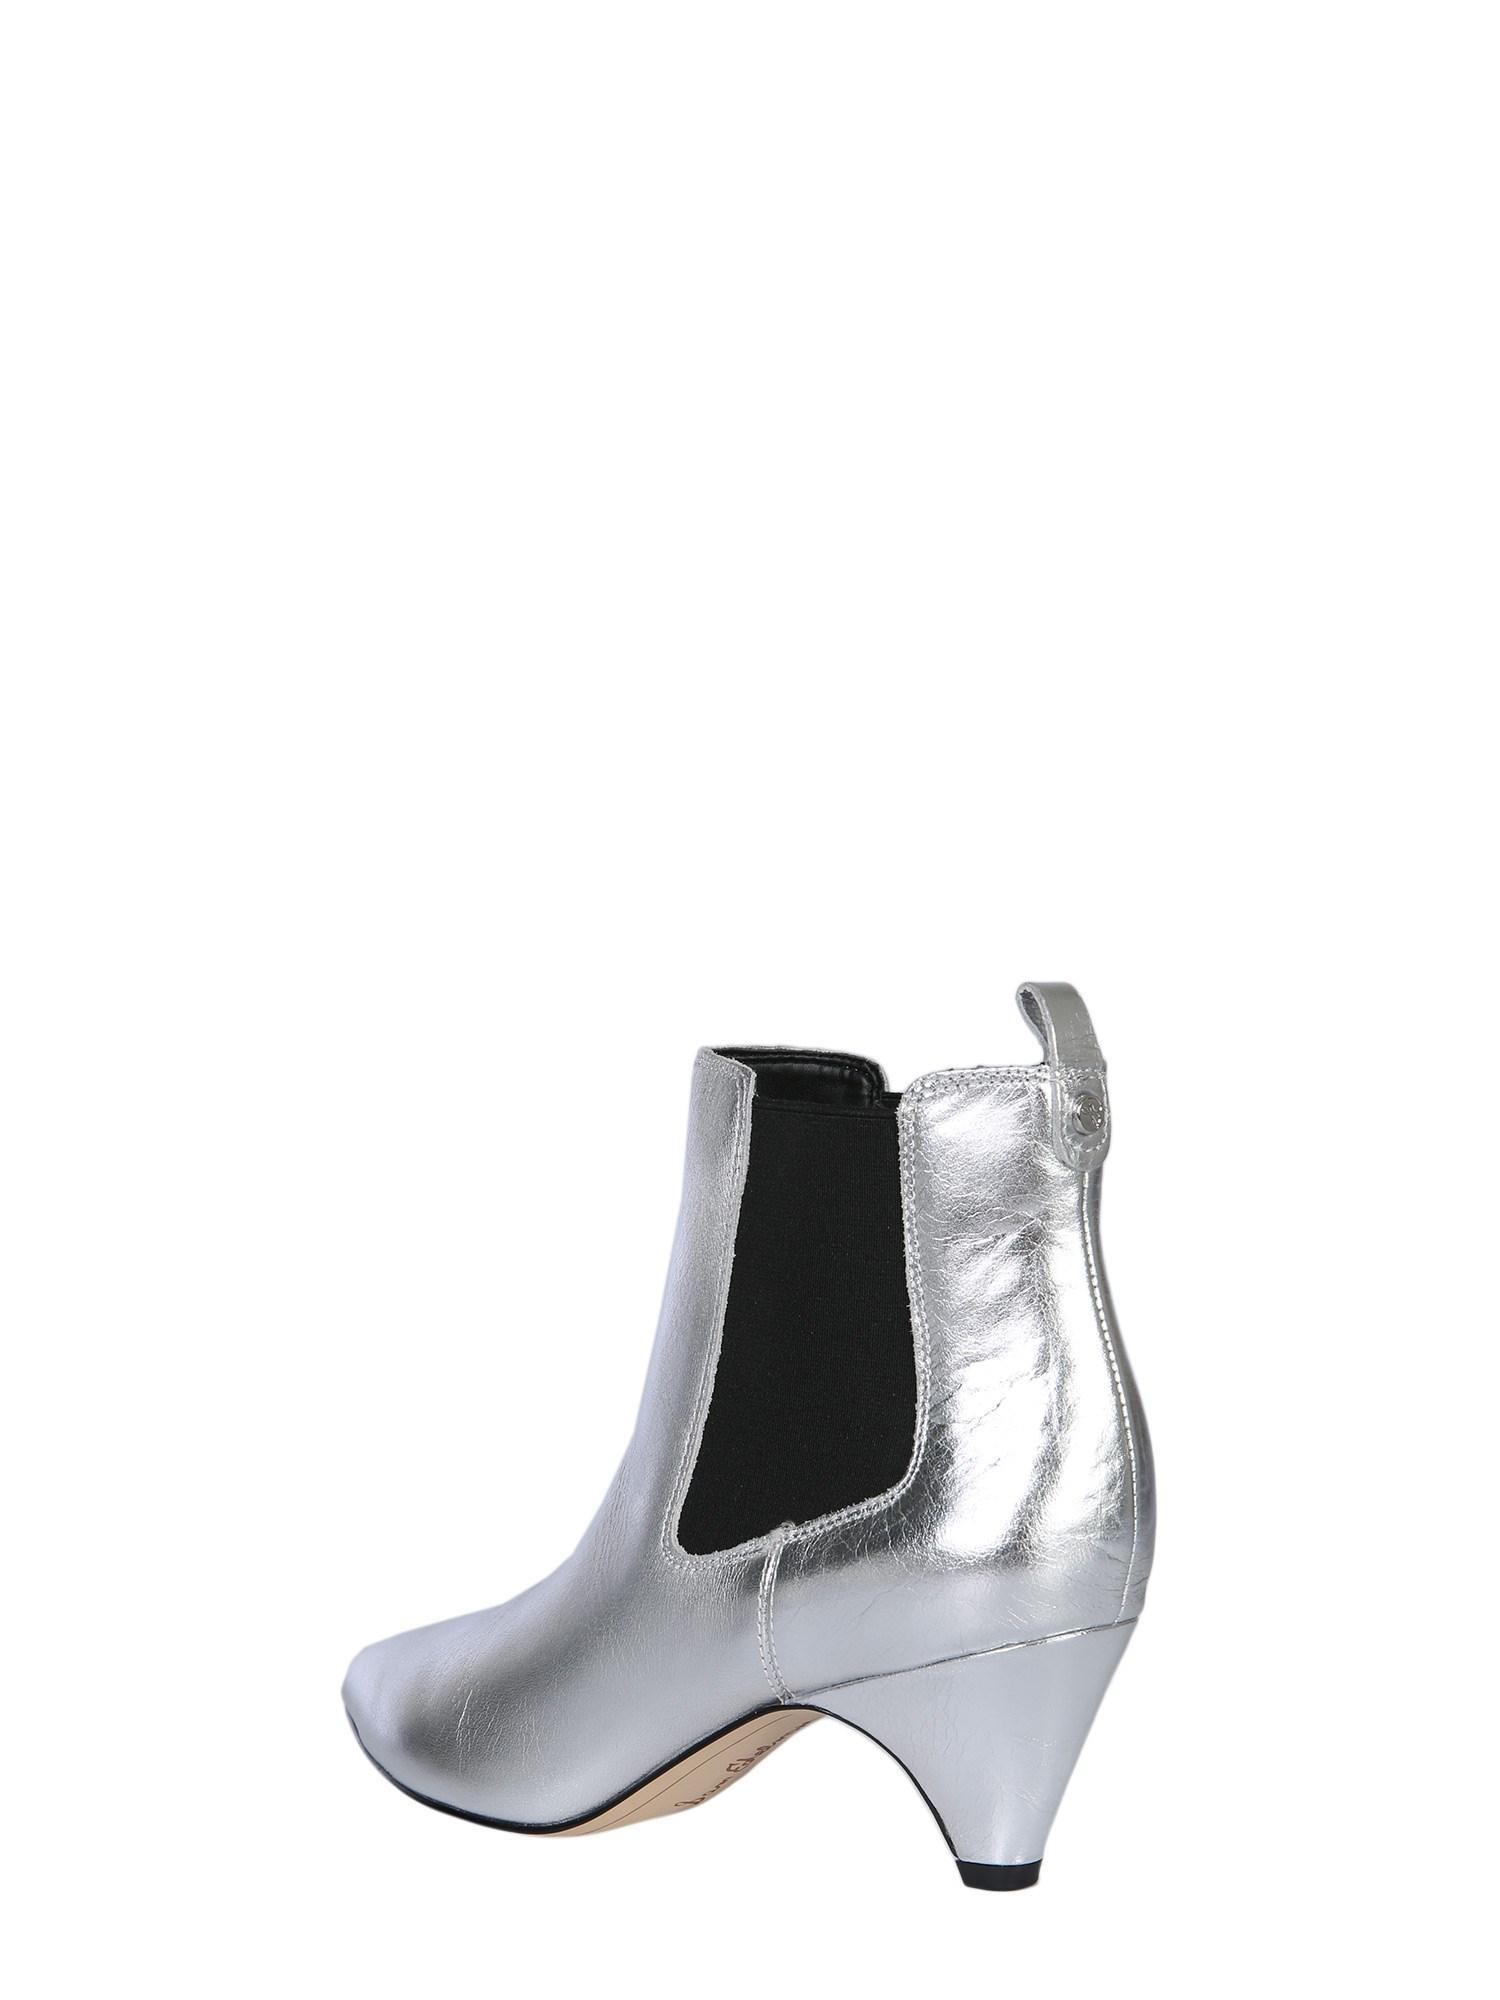 2c305b985 Sam Edelman Katt Leather Ankle Boots in Metallic - Save 34% - Lyst